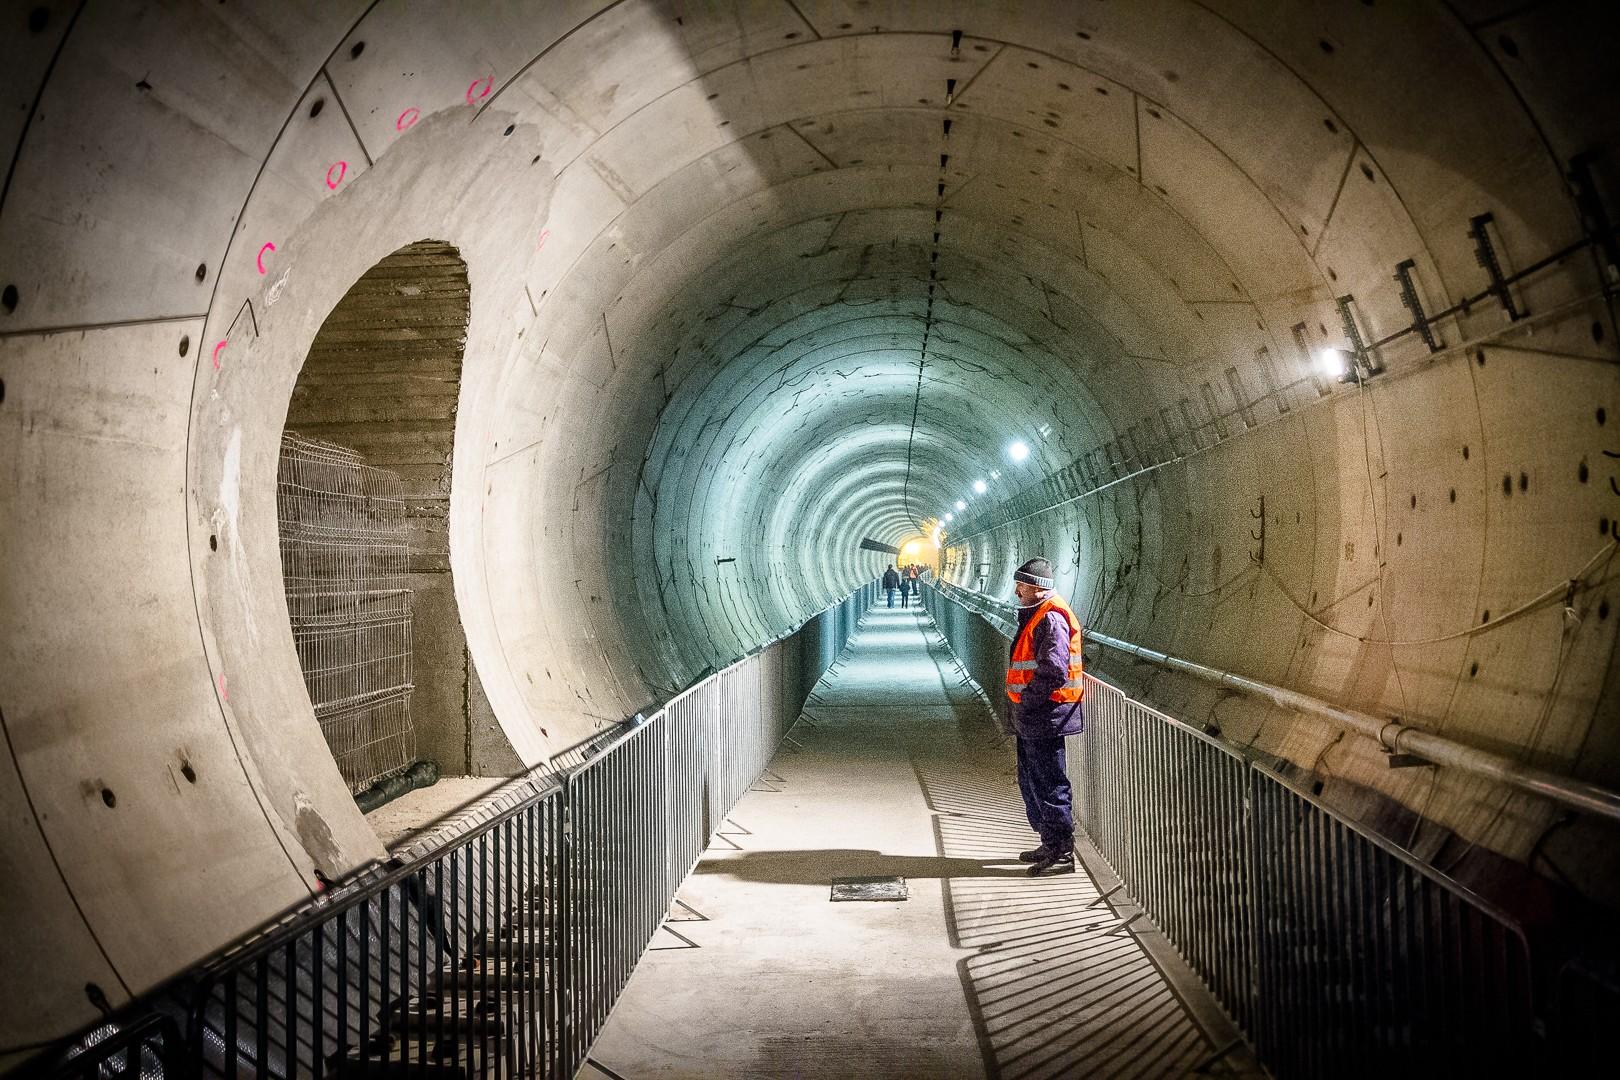 Metrou în Drumul Taberei? | IDEI URBANE  |Metrou Drumul Taberei